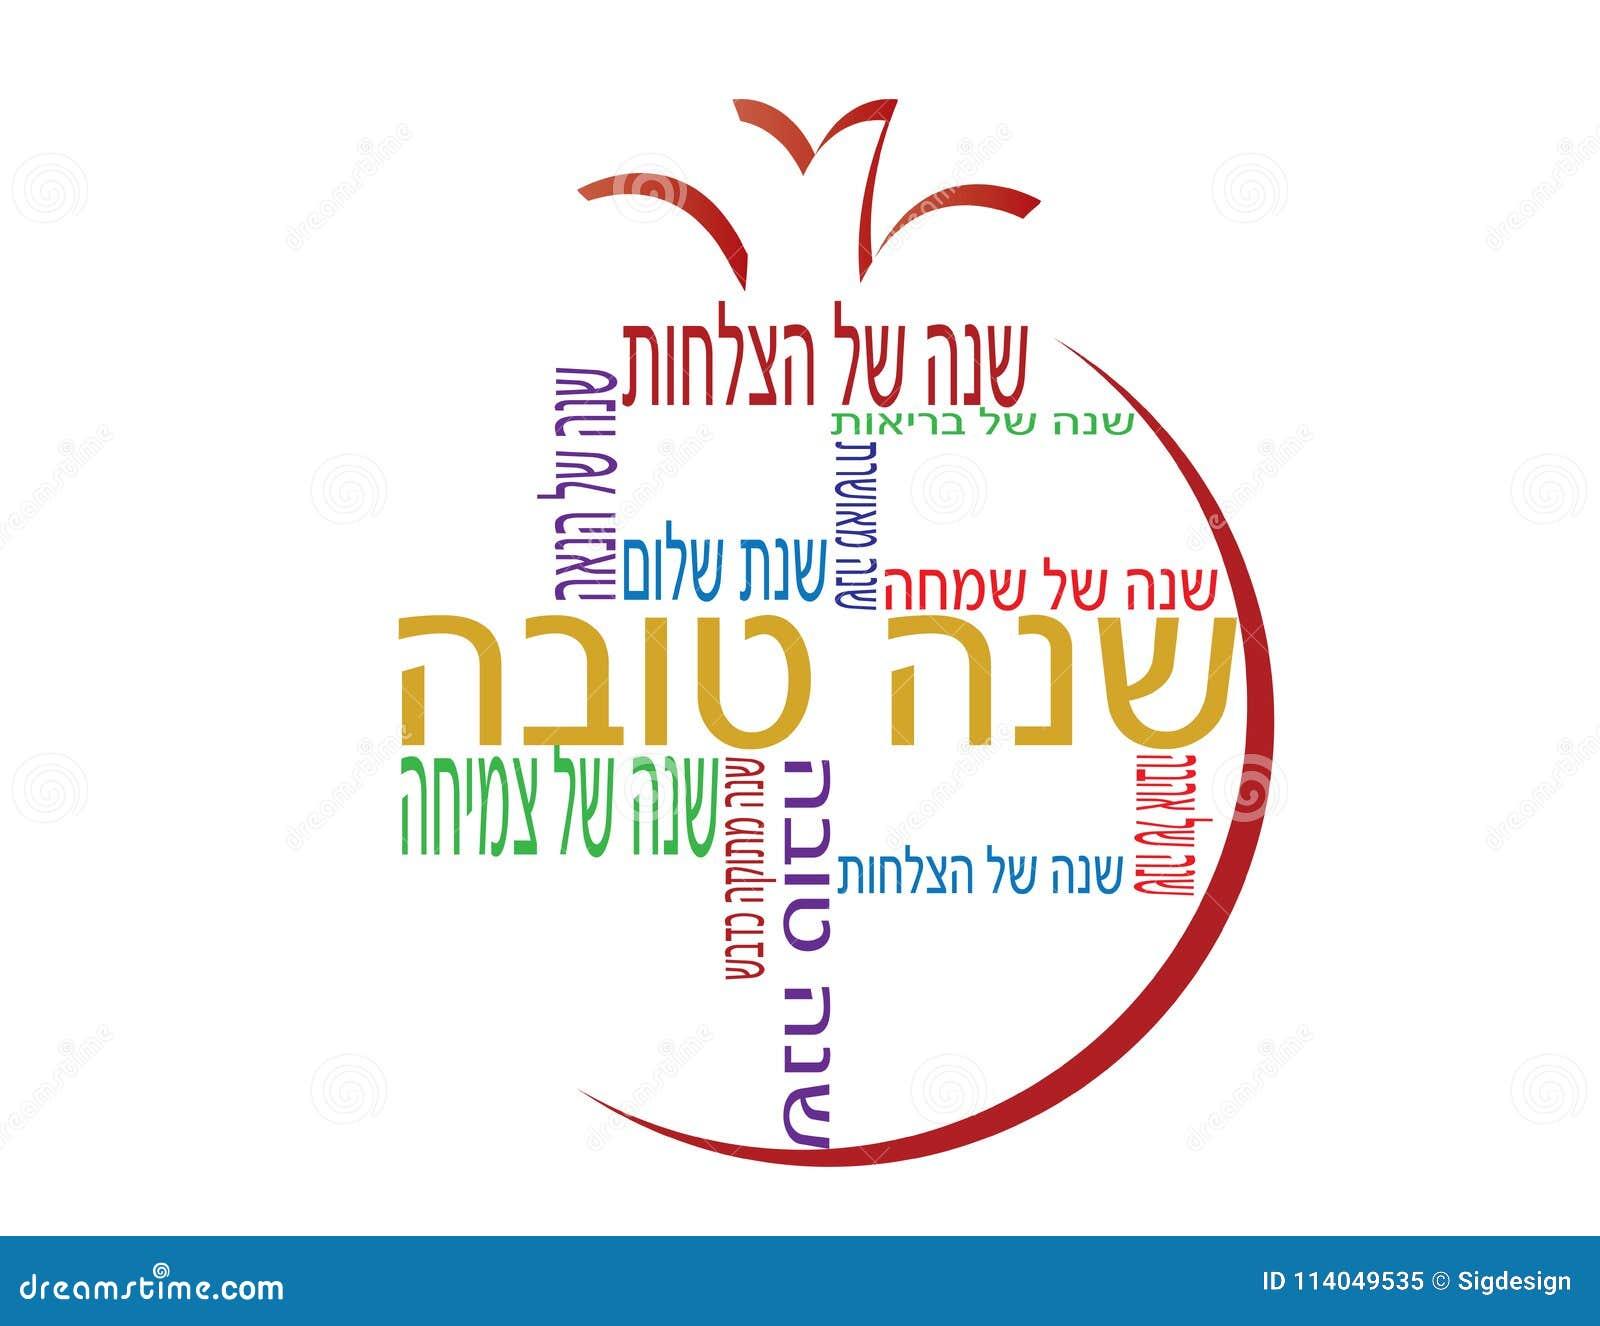 Pomegranate Shape Shana Tova Hebrew Banner With Different Hebrew